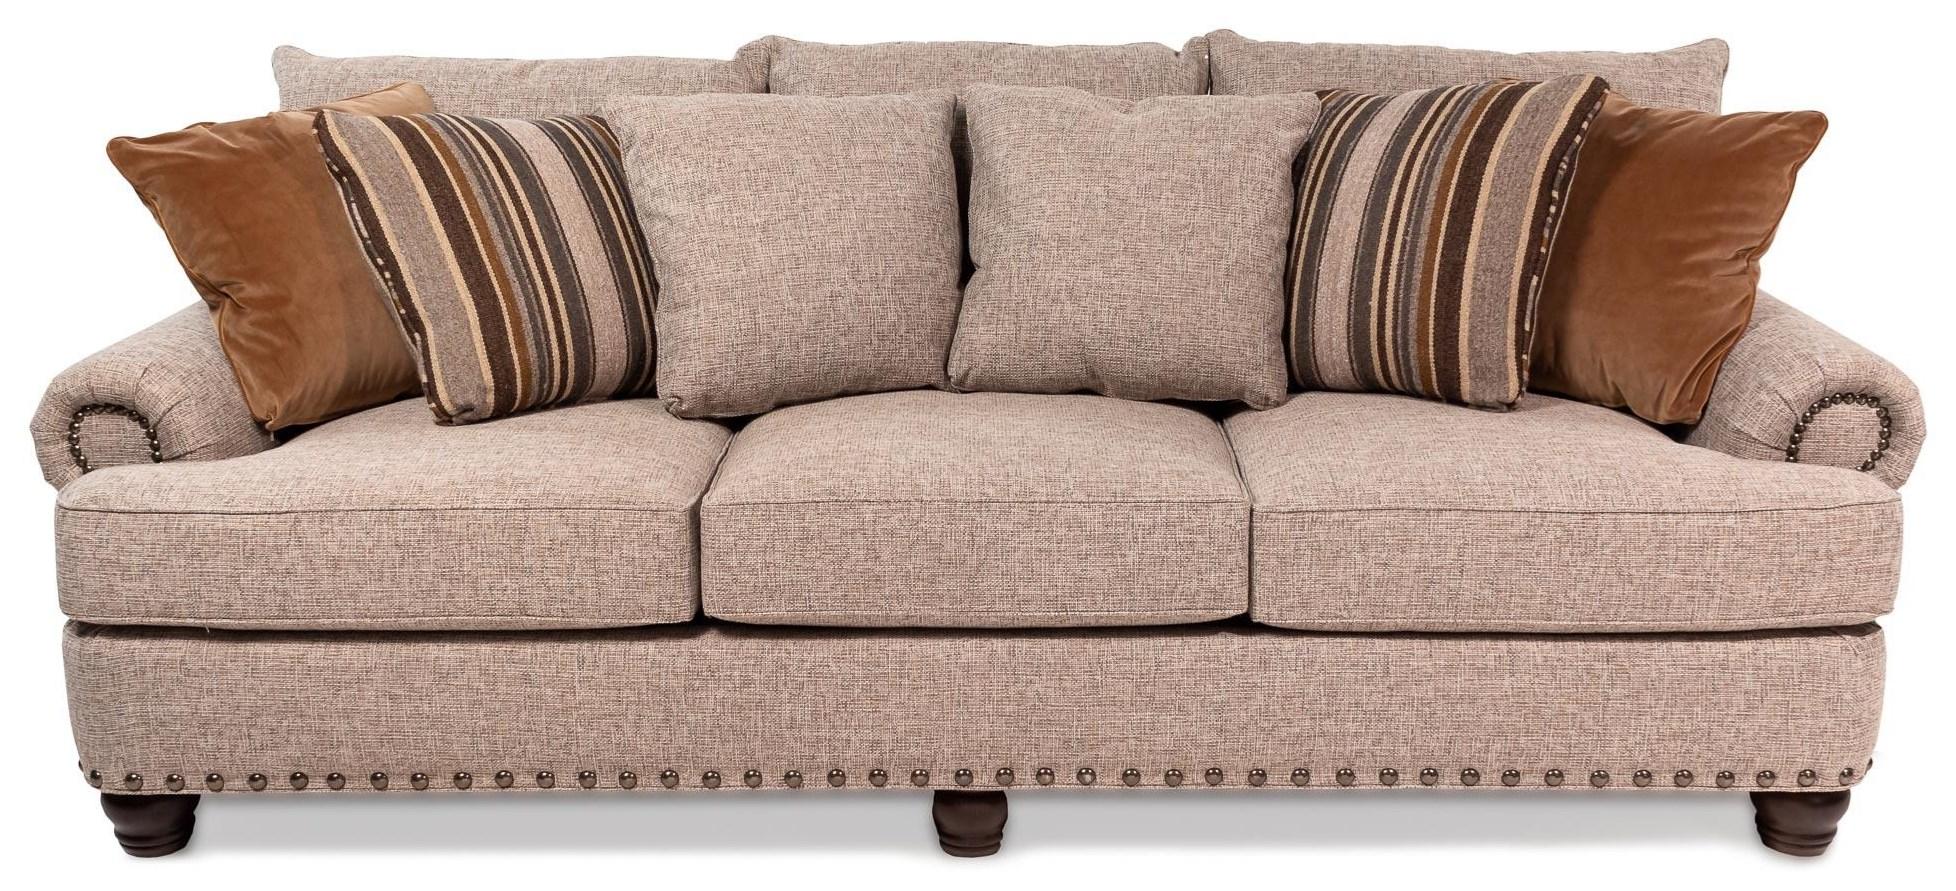 Roll Arm Sofa